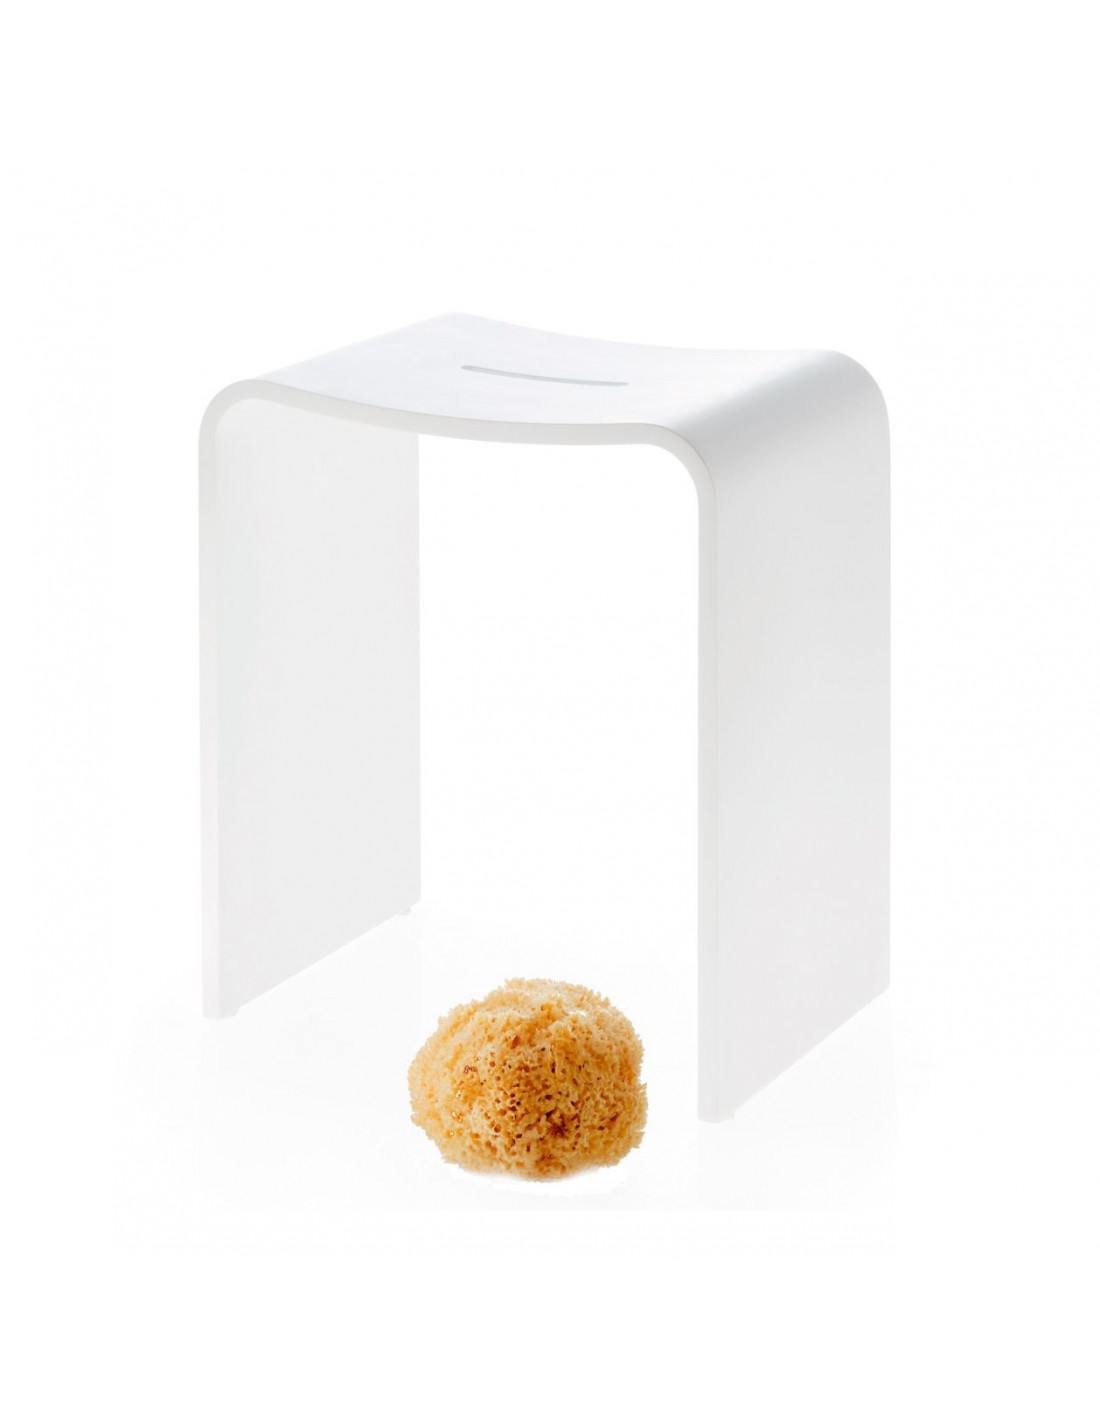 Tabouret STONE STOOL BLANC DECOR WALTHER - Valente Design